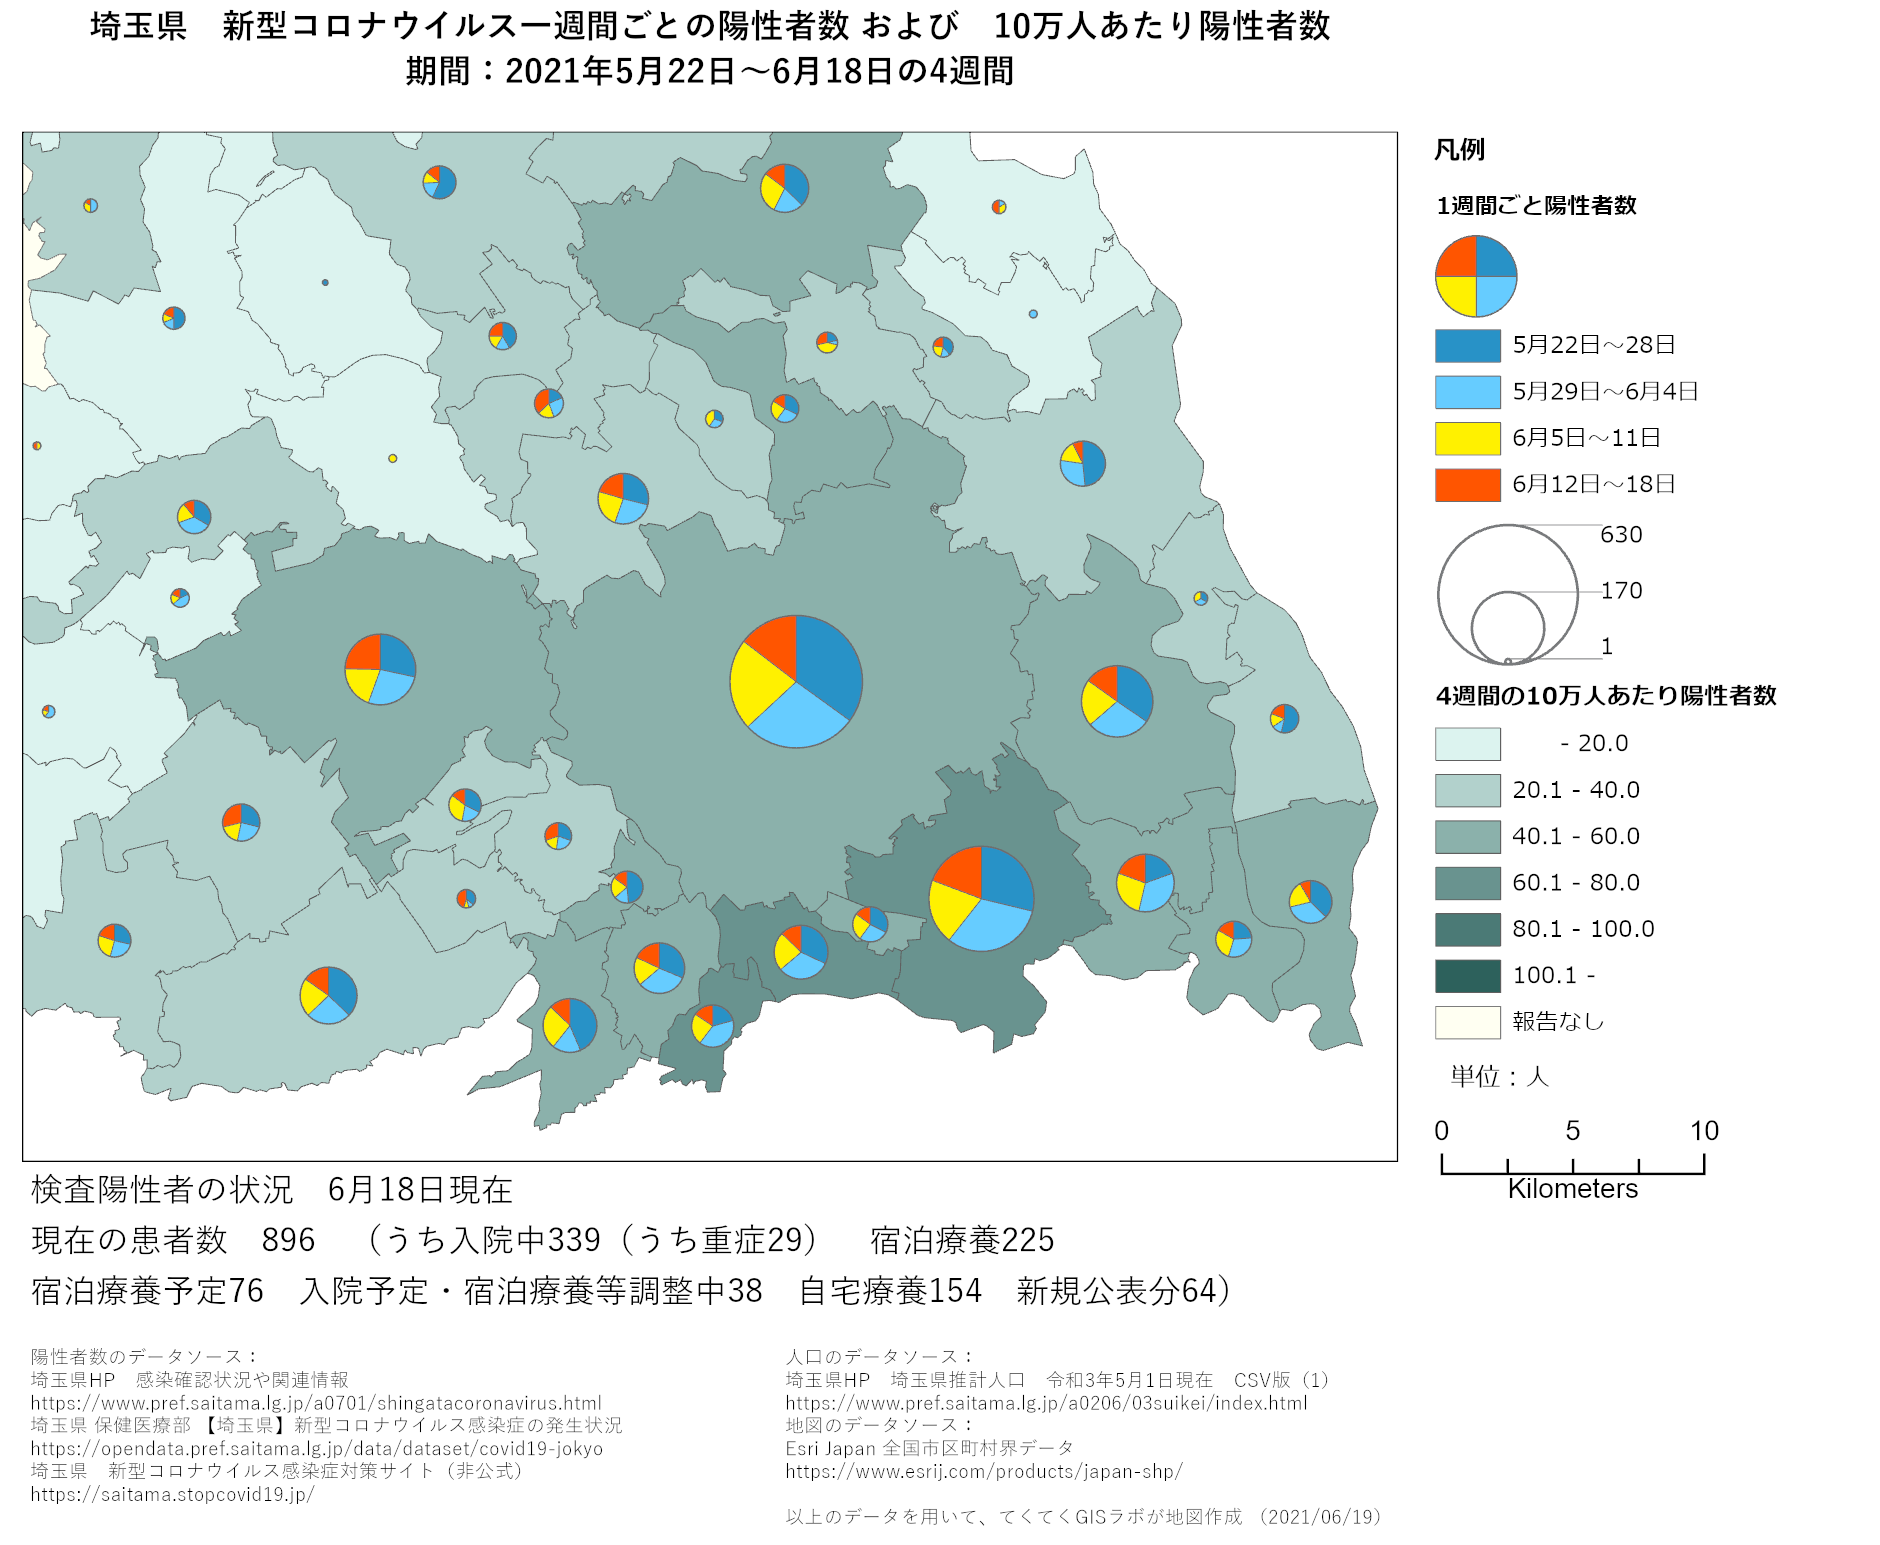 1週間ごと感染者数、埼玉県、5月22日〜6月18日